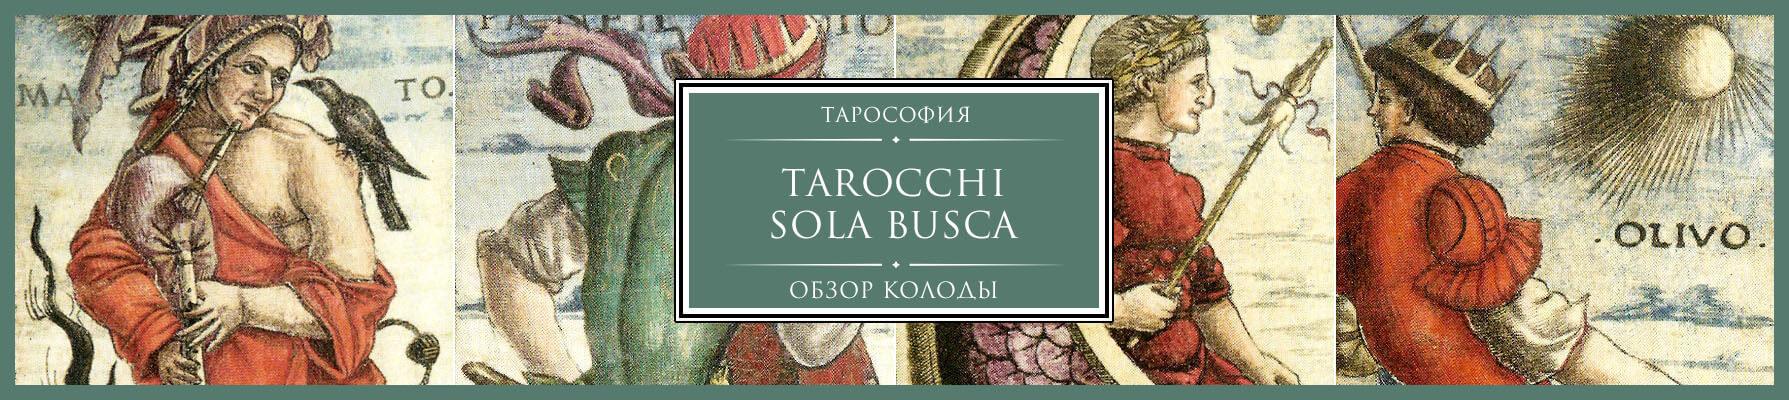 Обзор колод Таро: Сола Буска